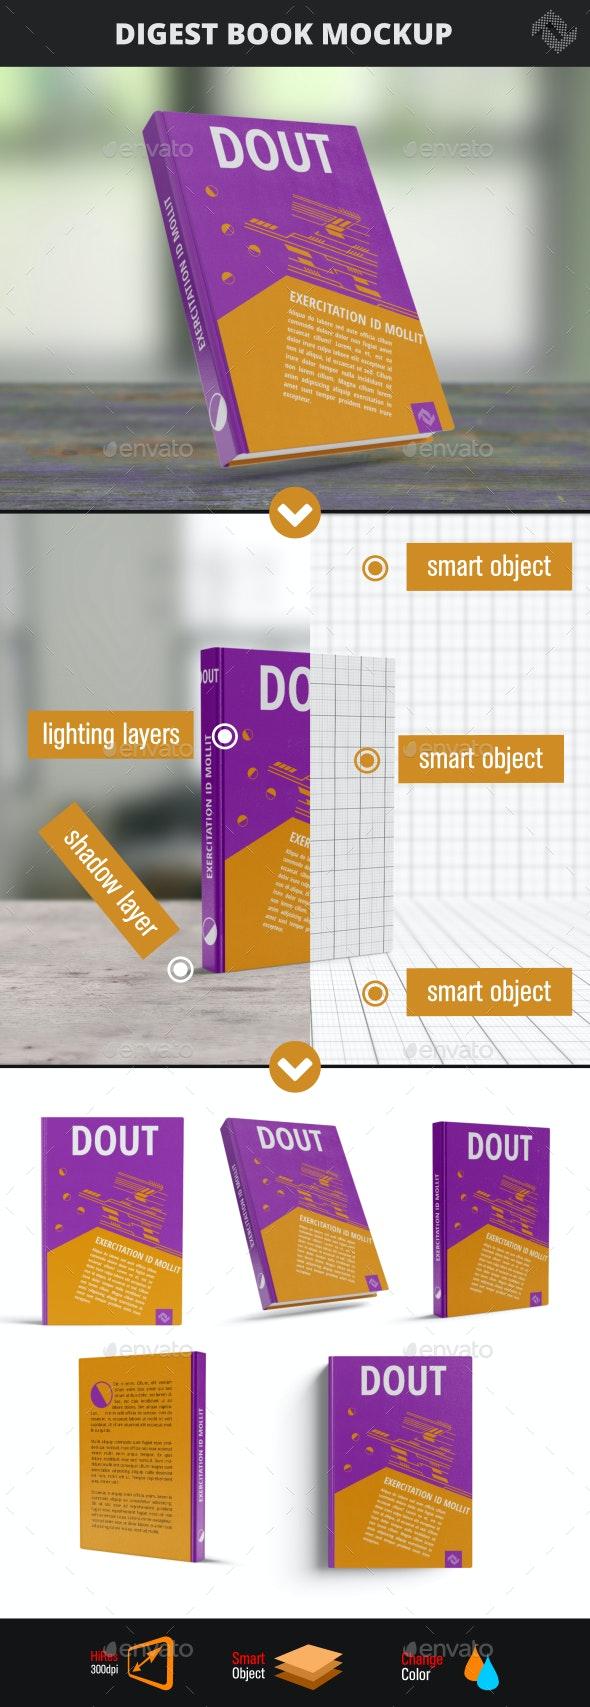 Digest Hard Cover Book Mockup - Books Print